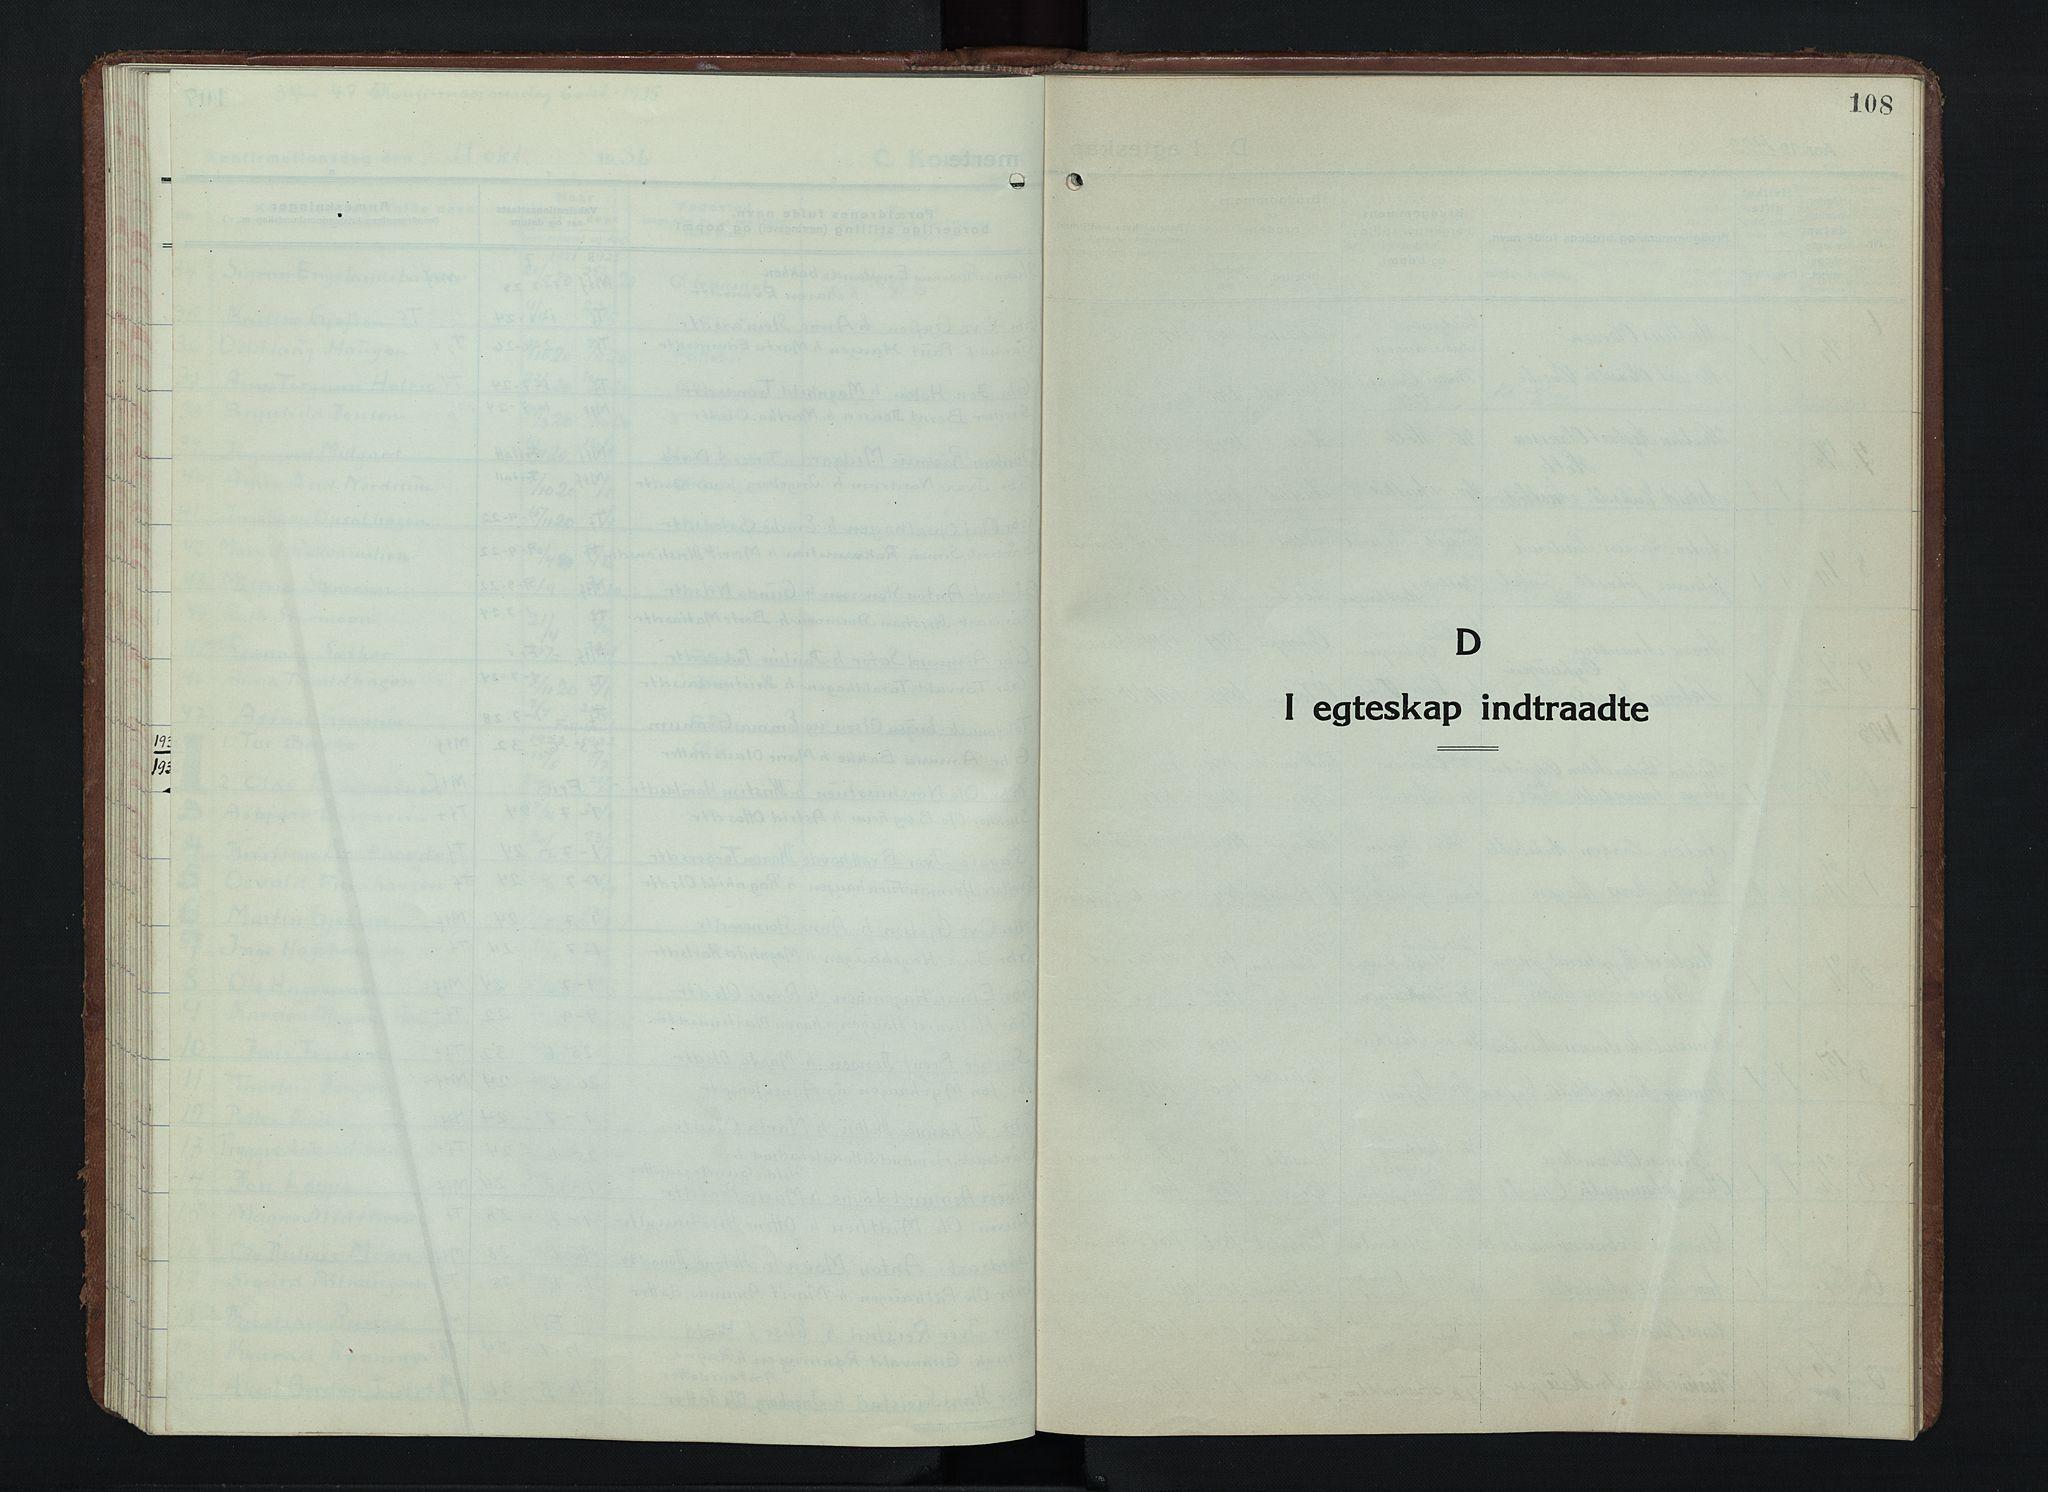 SAH, Østre Gausdal prestekontor, Klokkerbok nr. 6, 1922-1945, s. 108